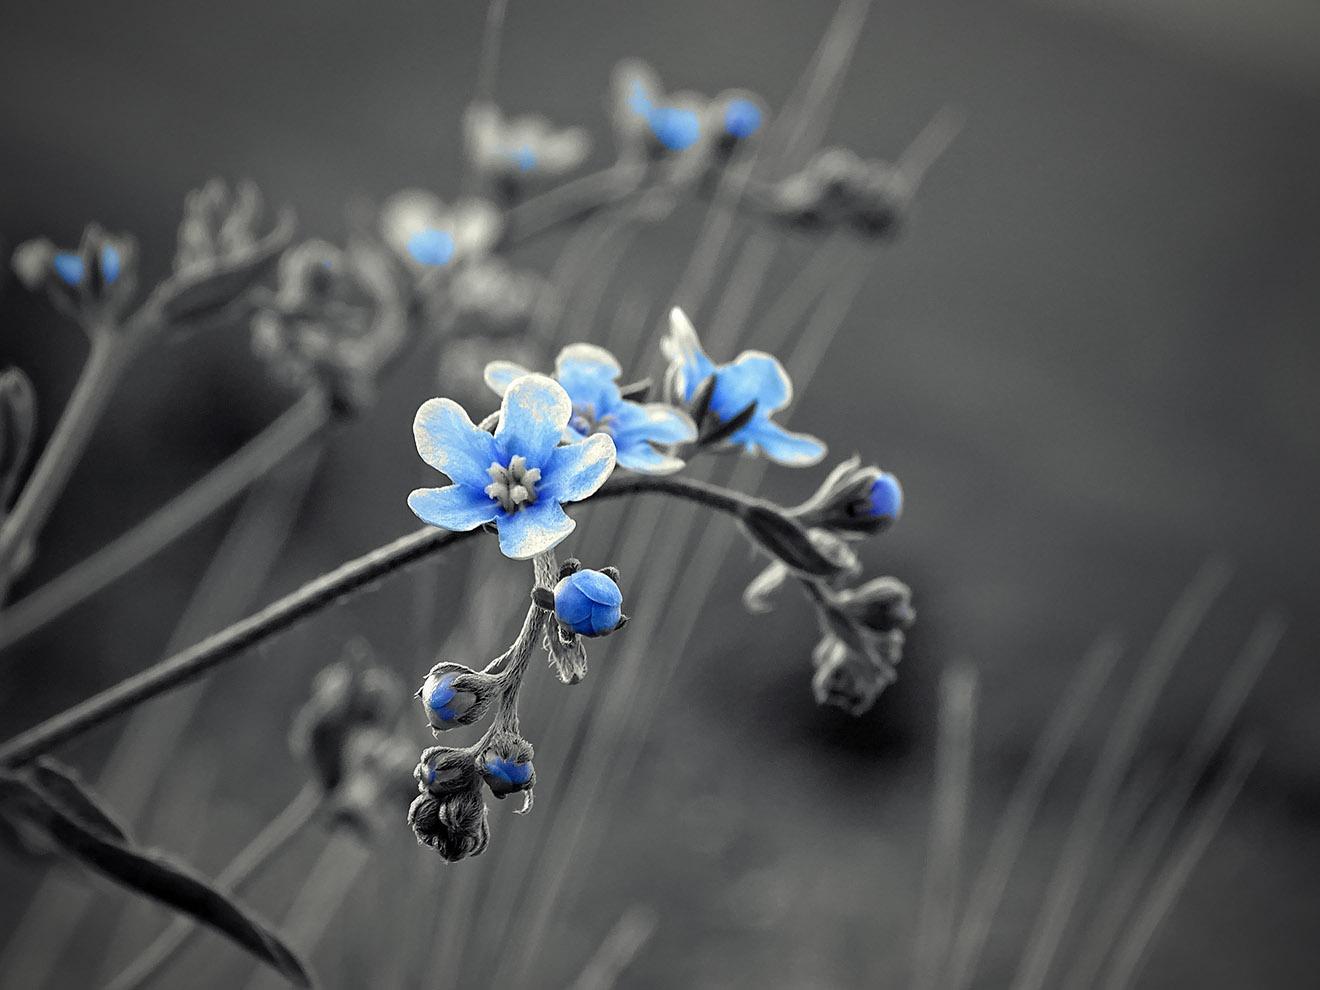 The blue flowers by Jamal 4 Rojava